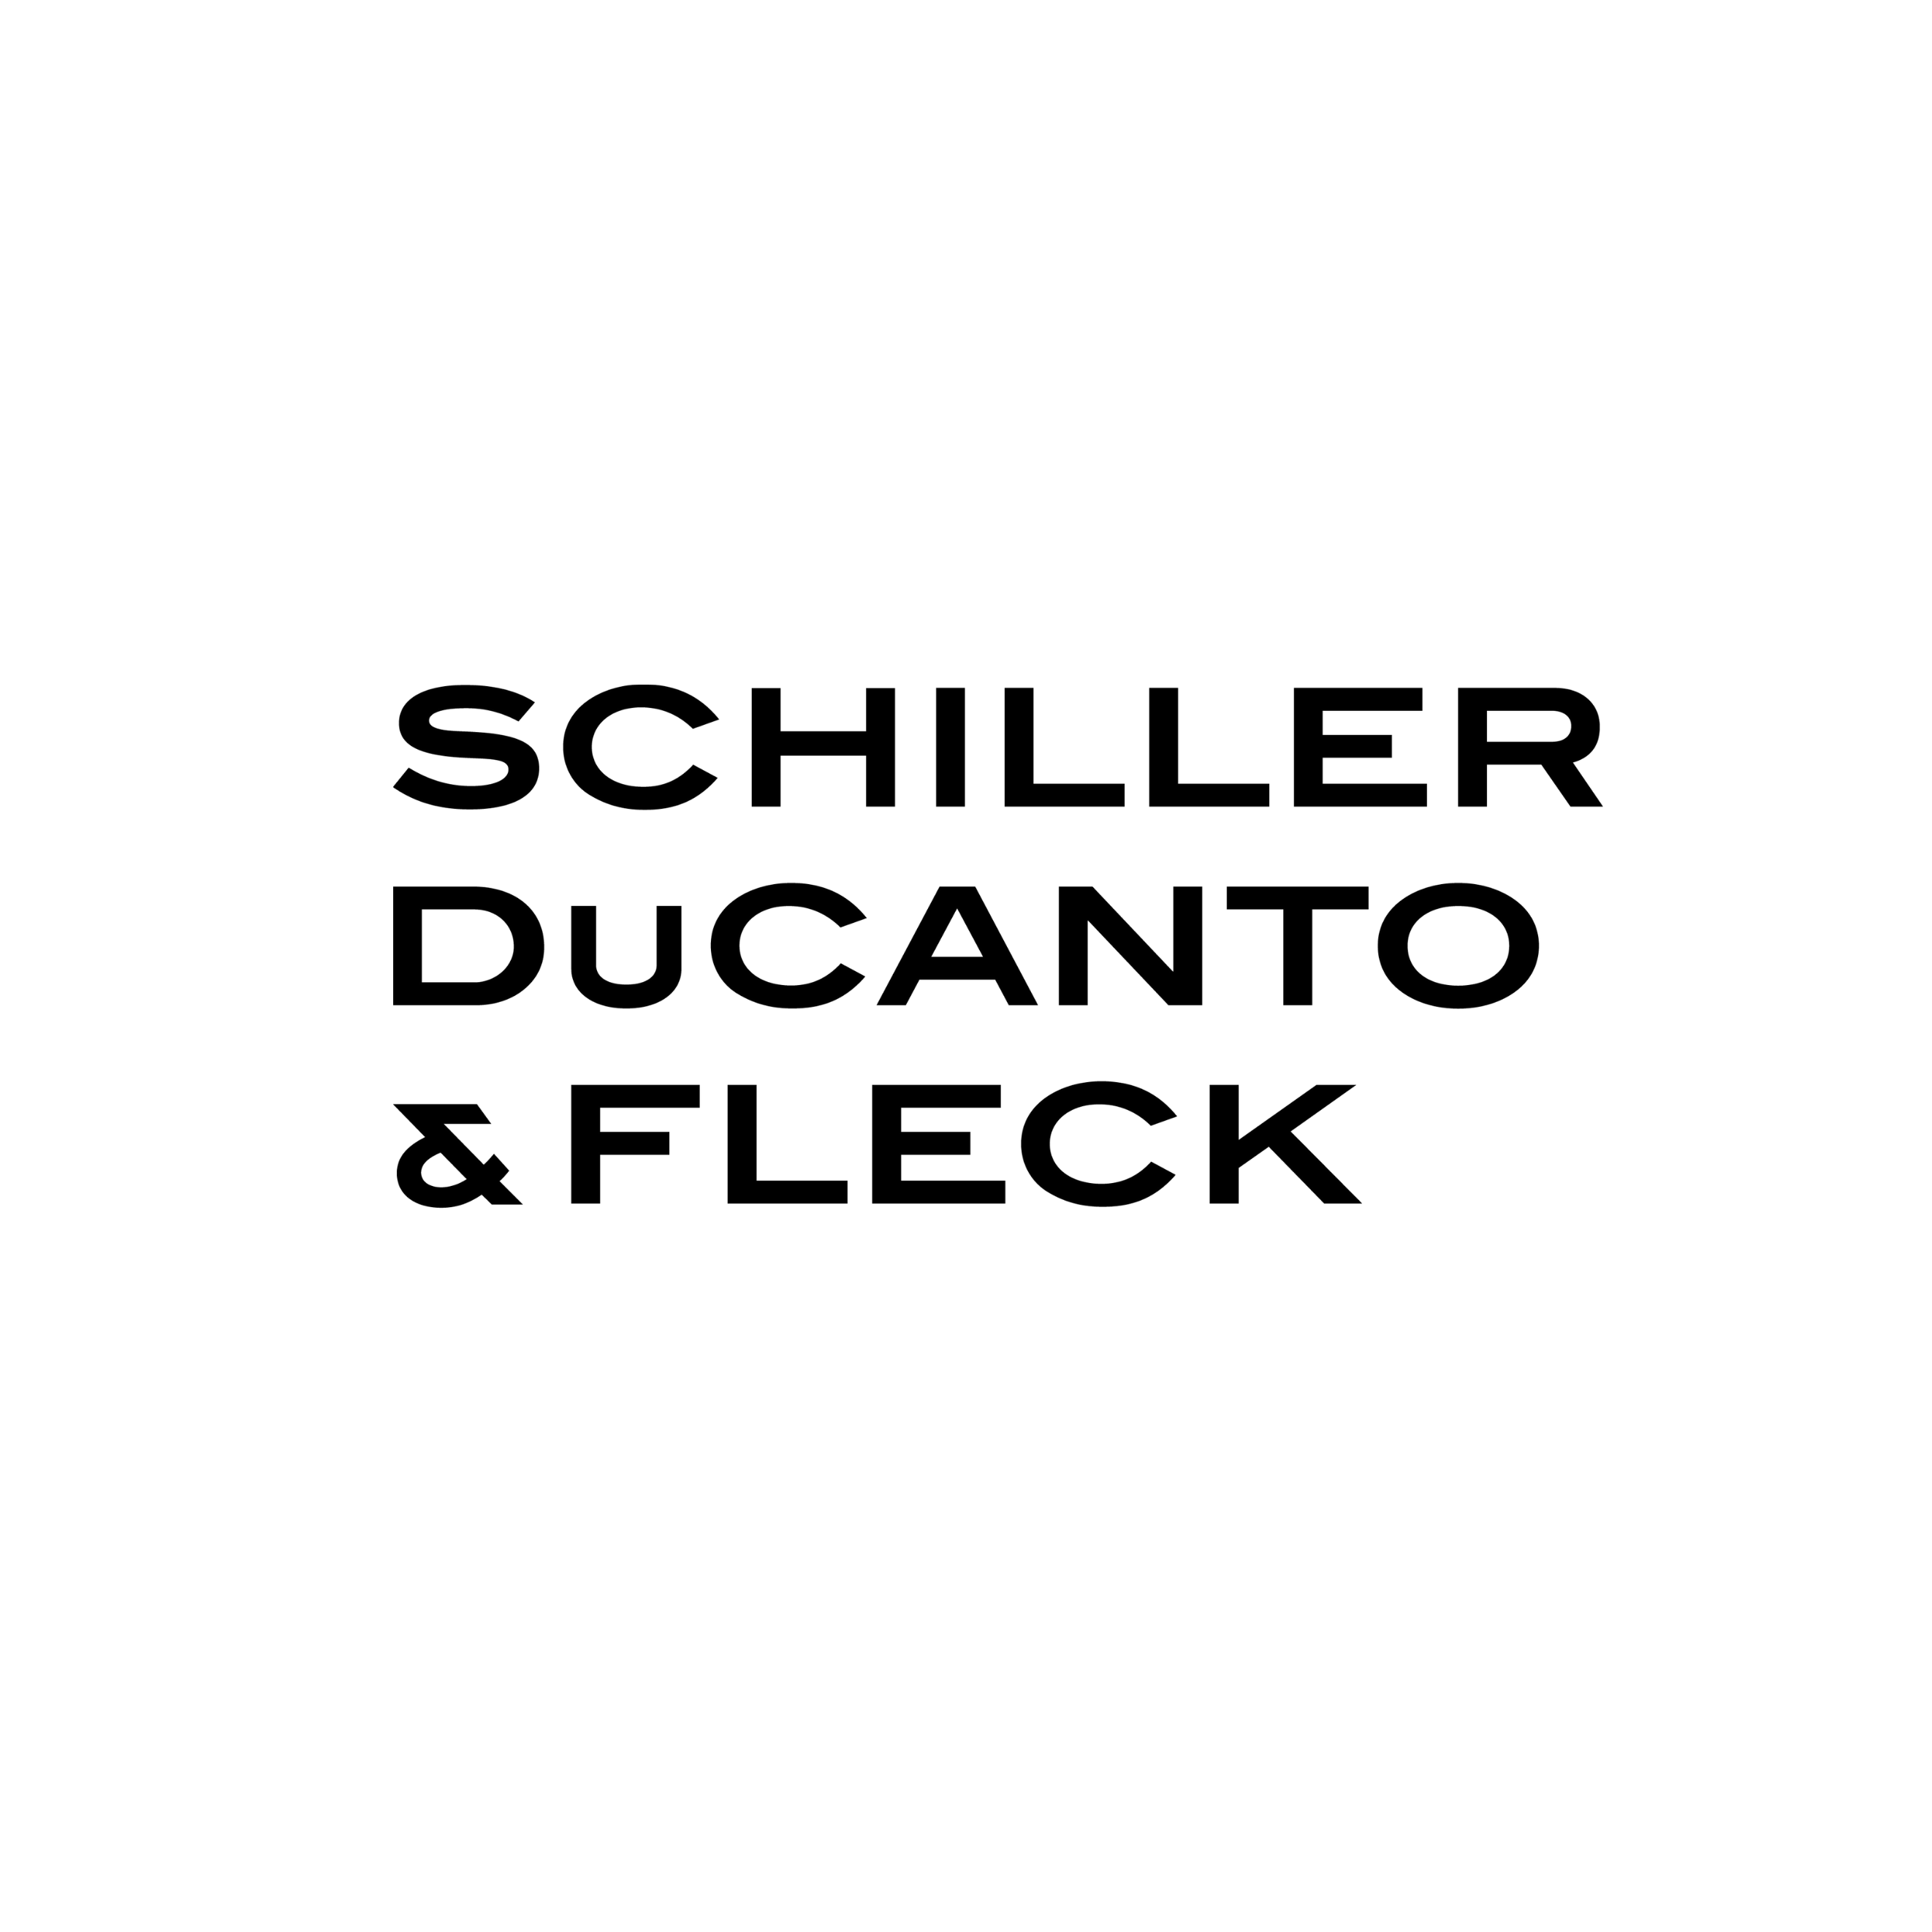 Schiller DuCanto & Fleck LLP law firm logo